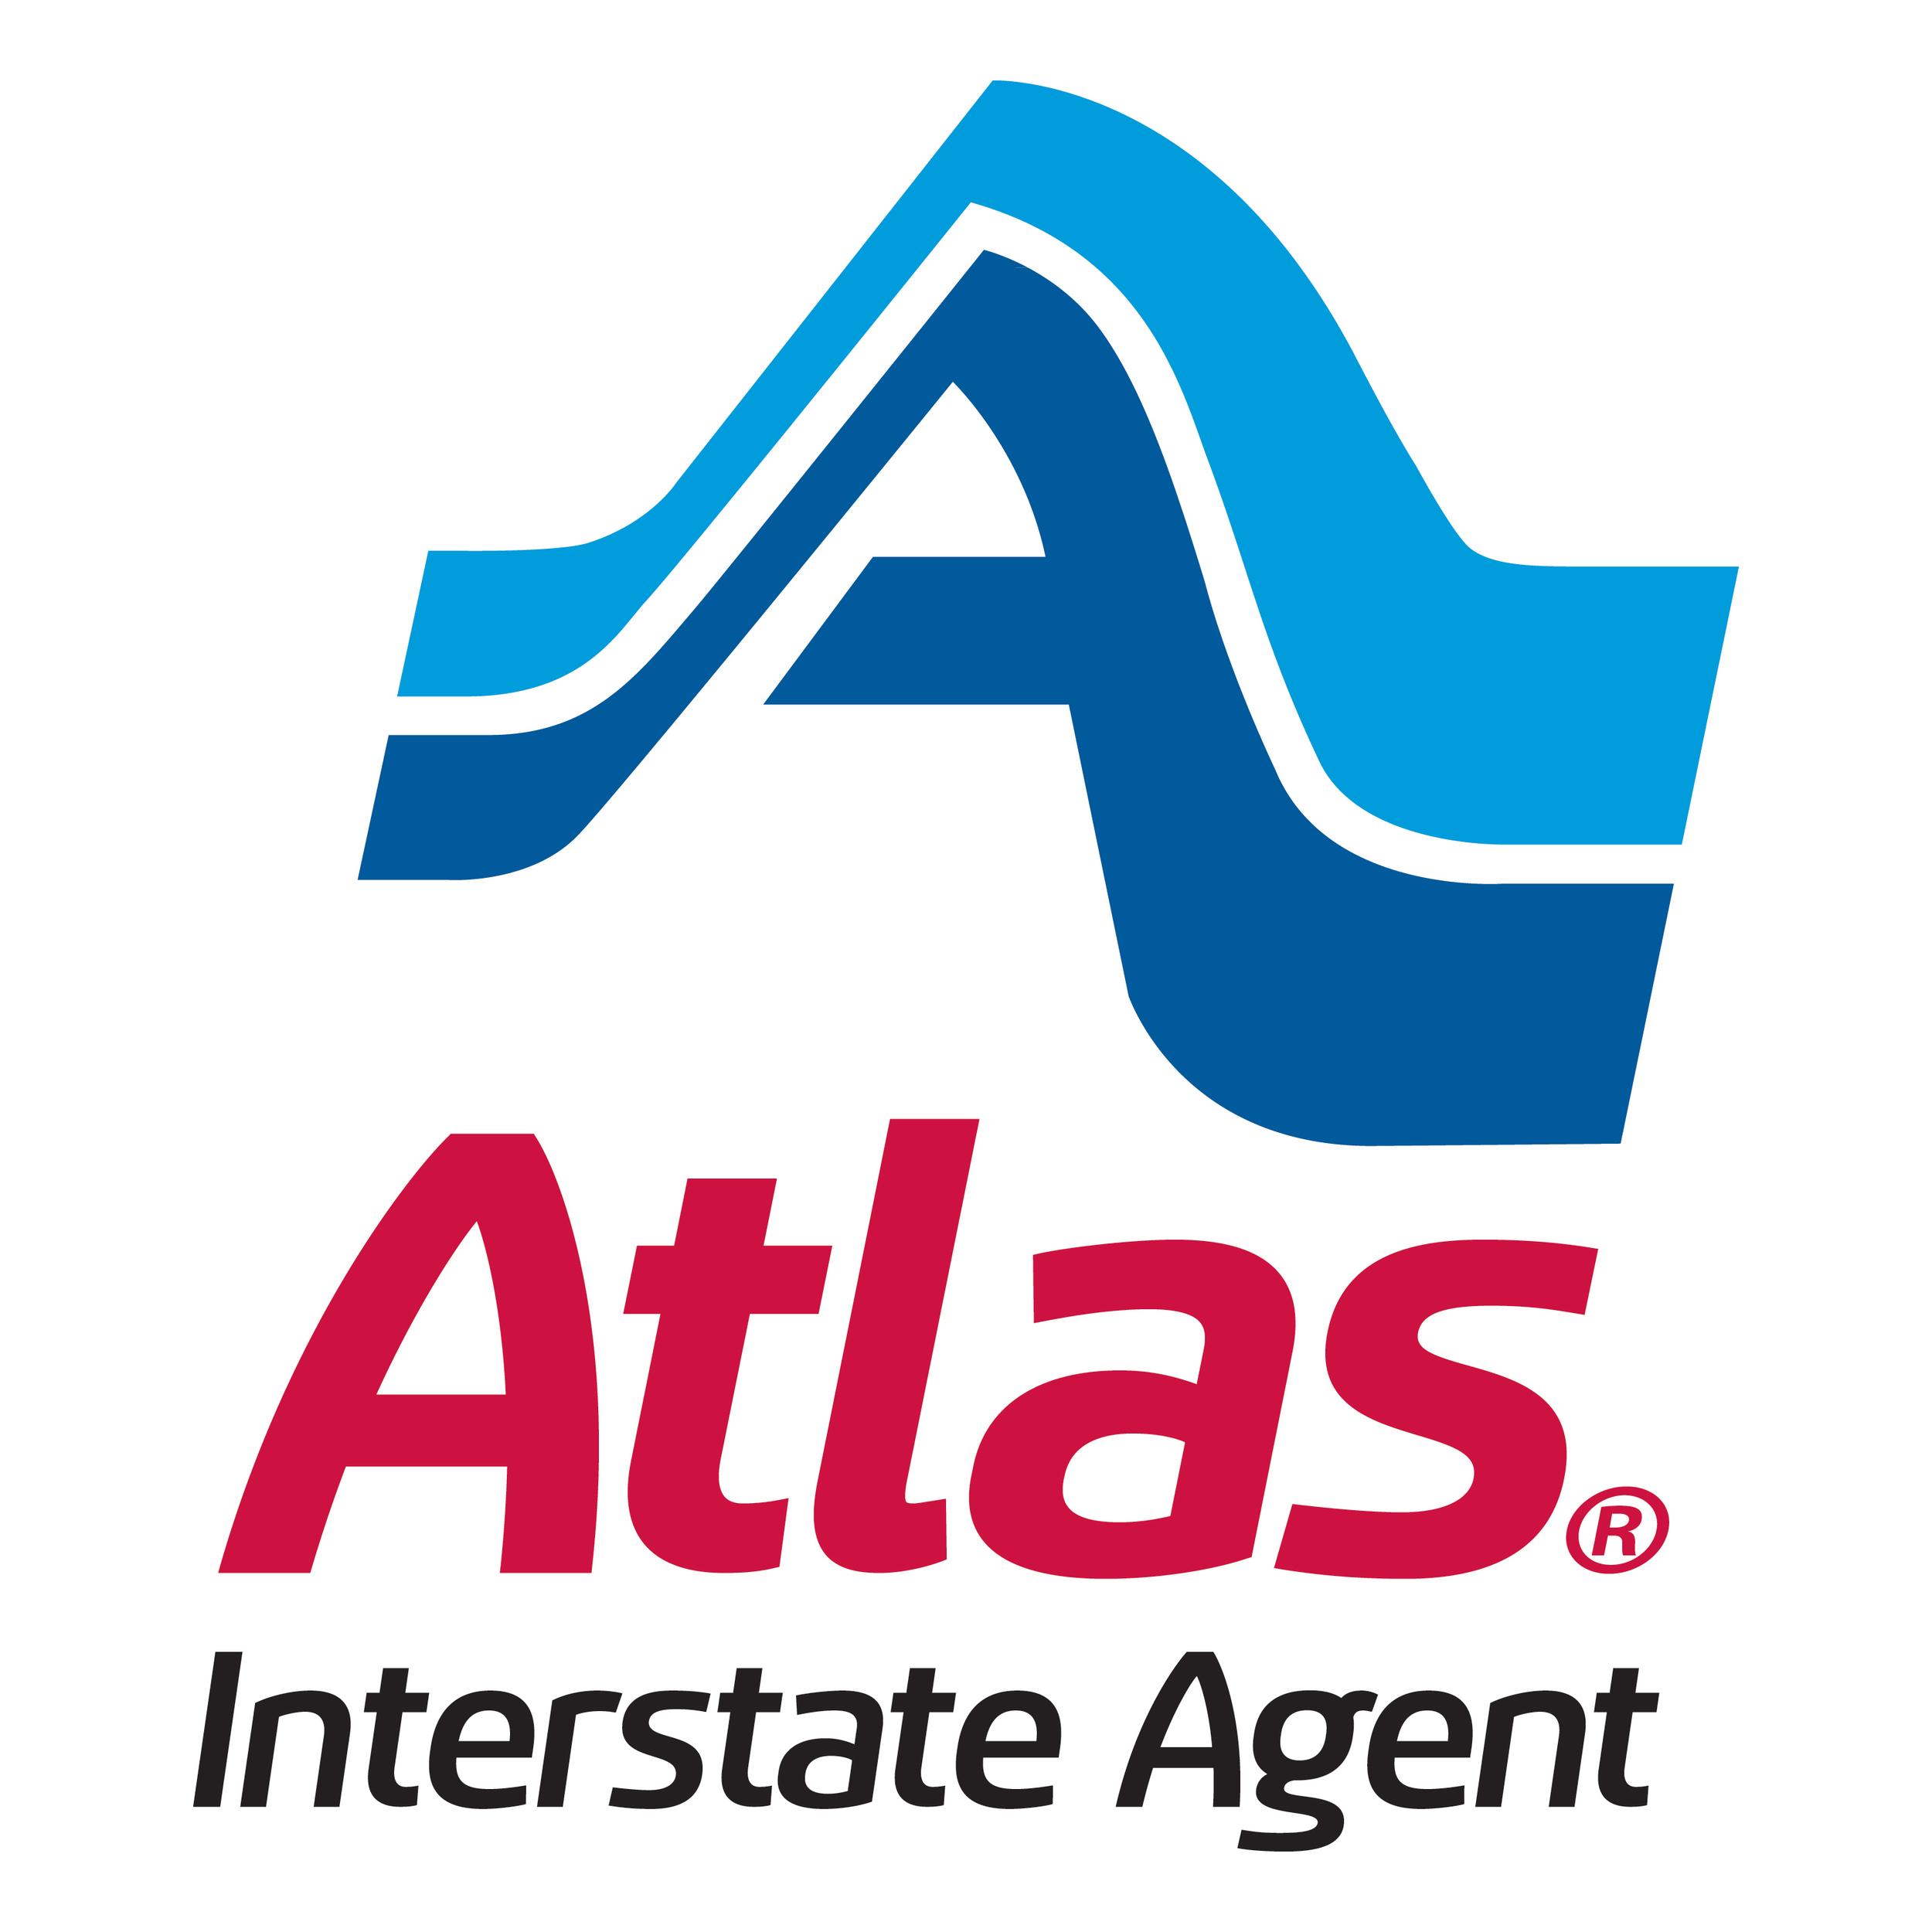 Atlas-Interstate-Agent-Logo-1-lrg.png